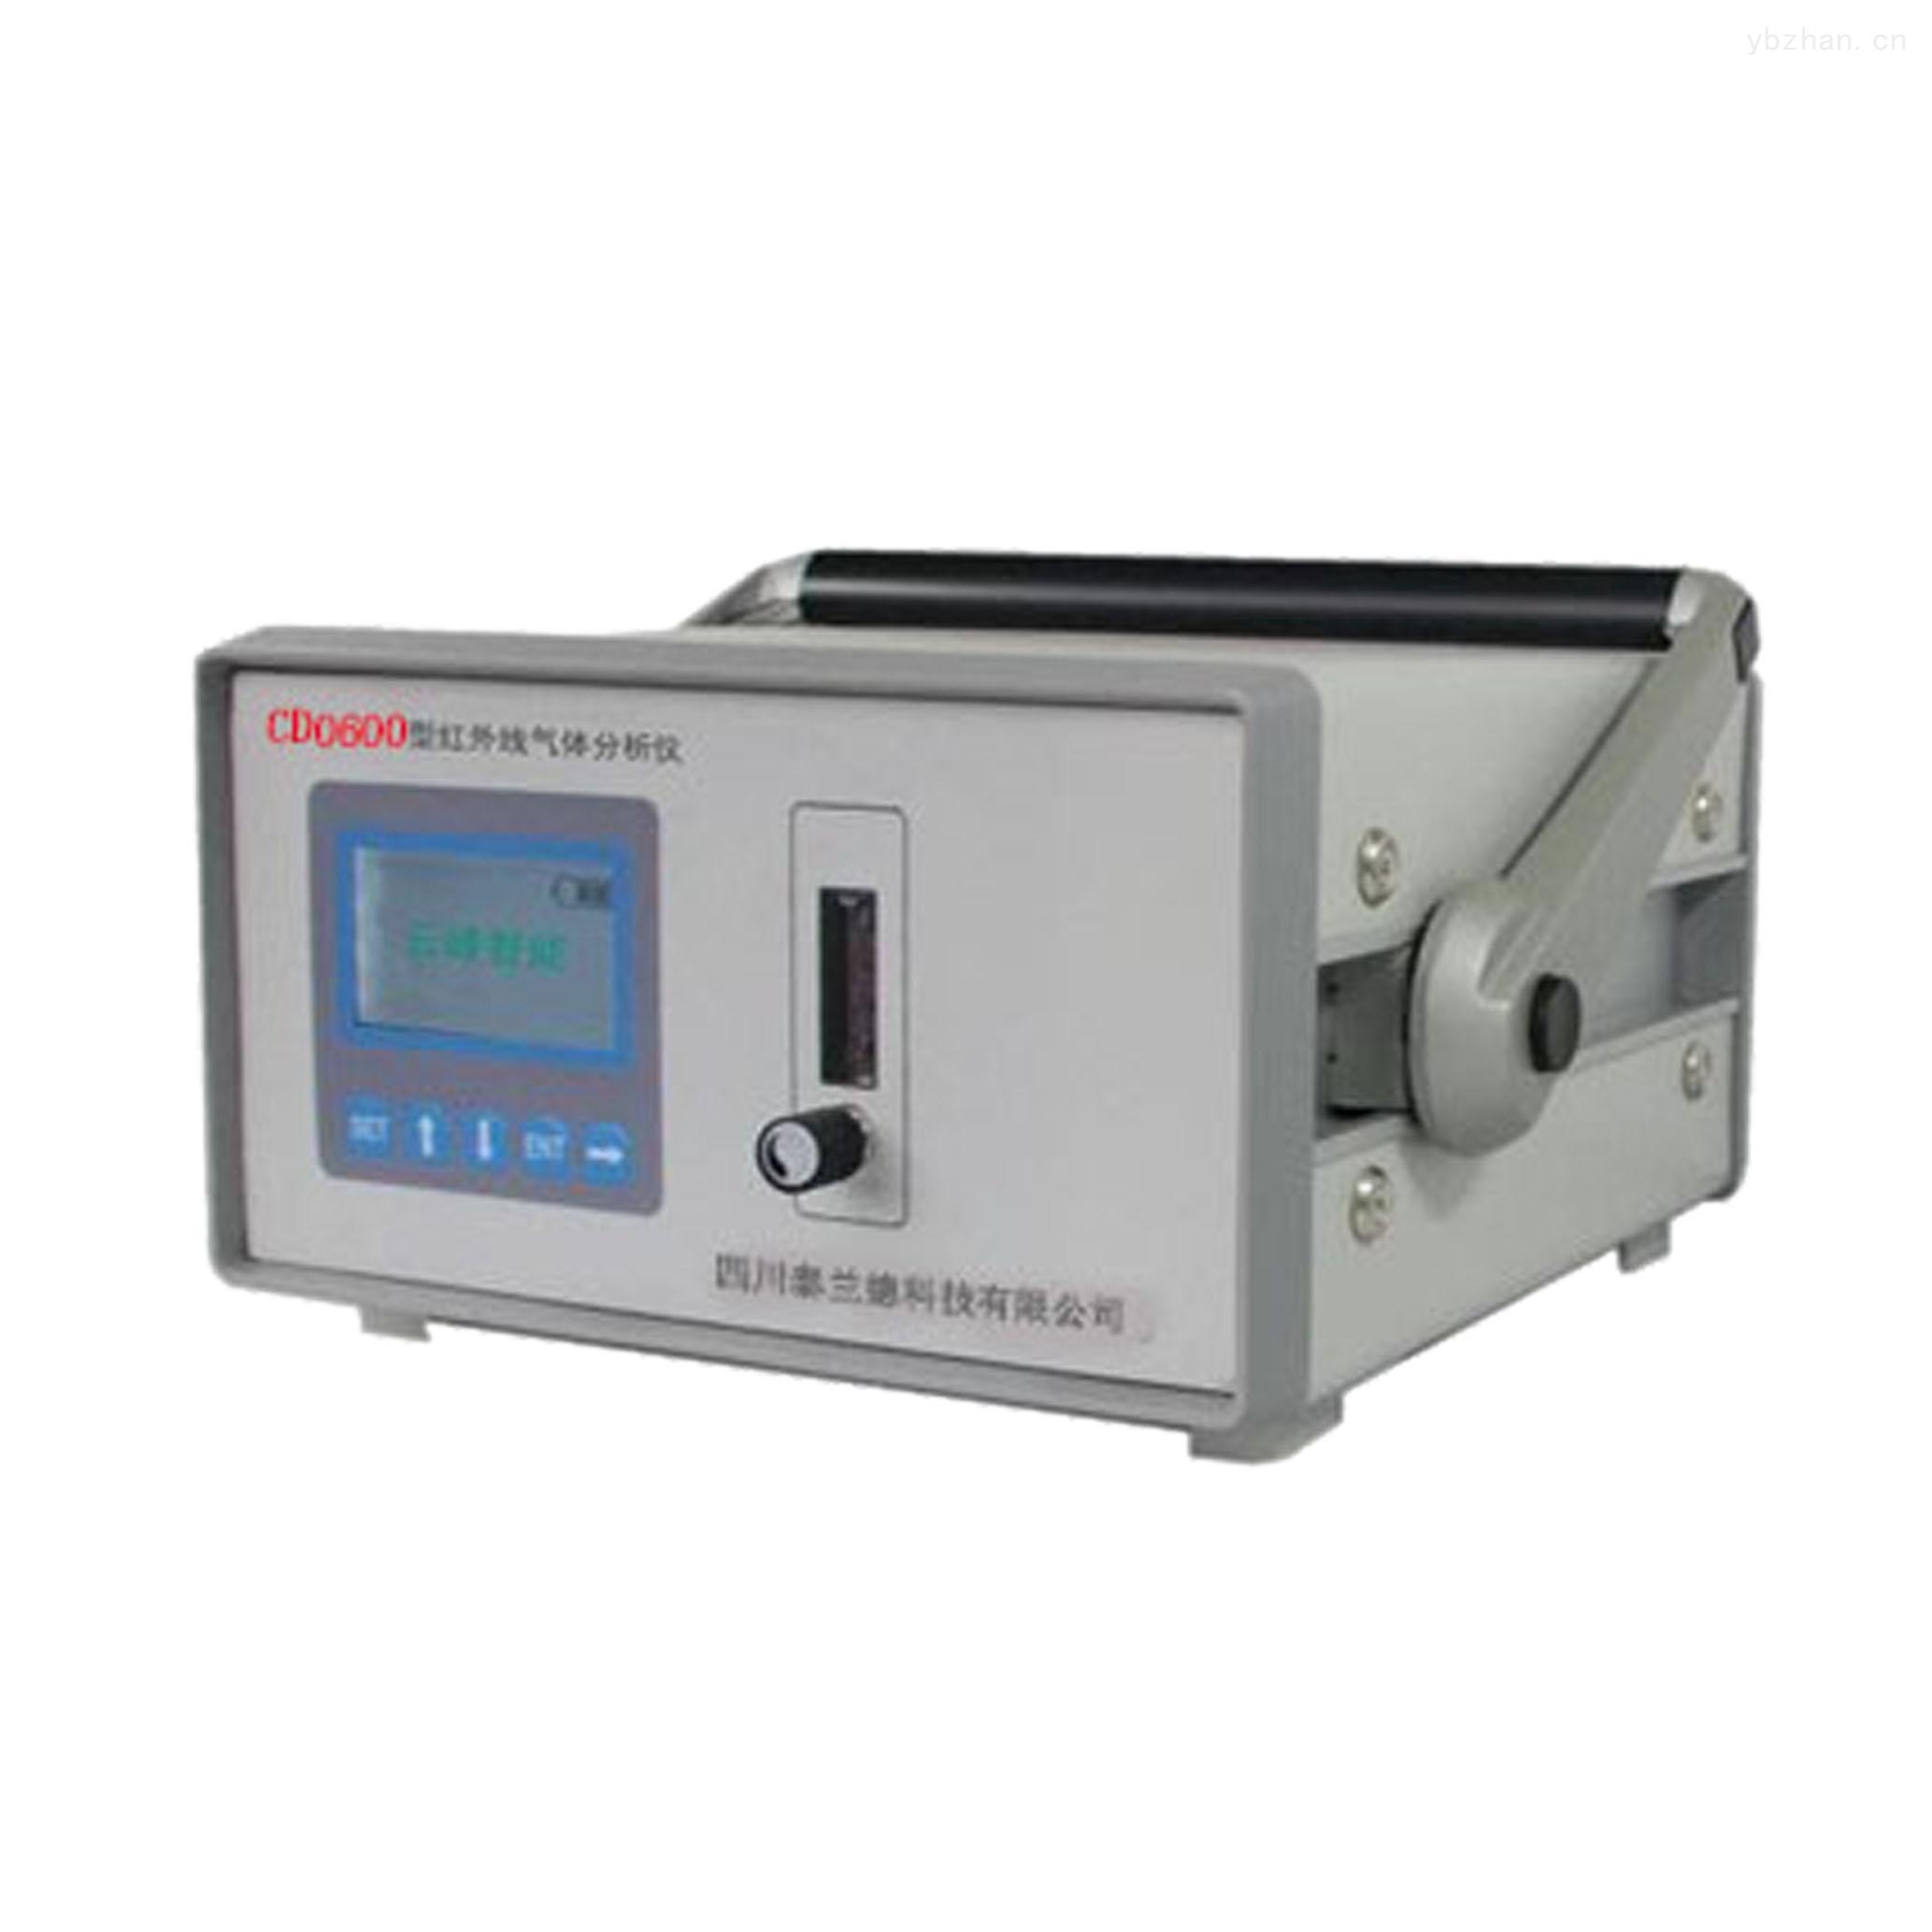 CDO600型紅外線氣體分析儀廠家